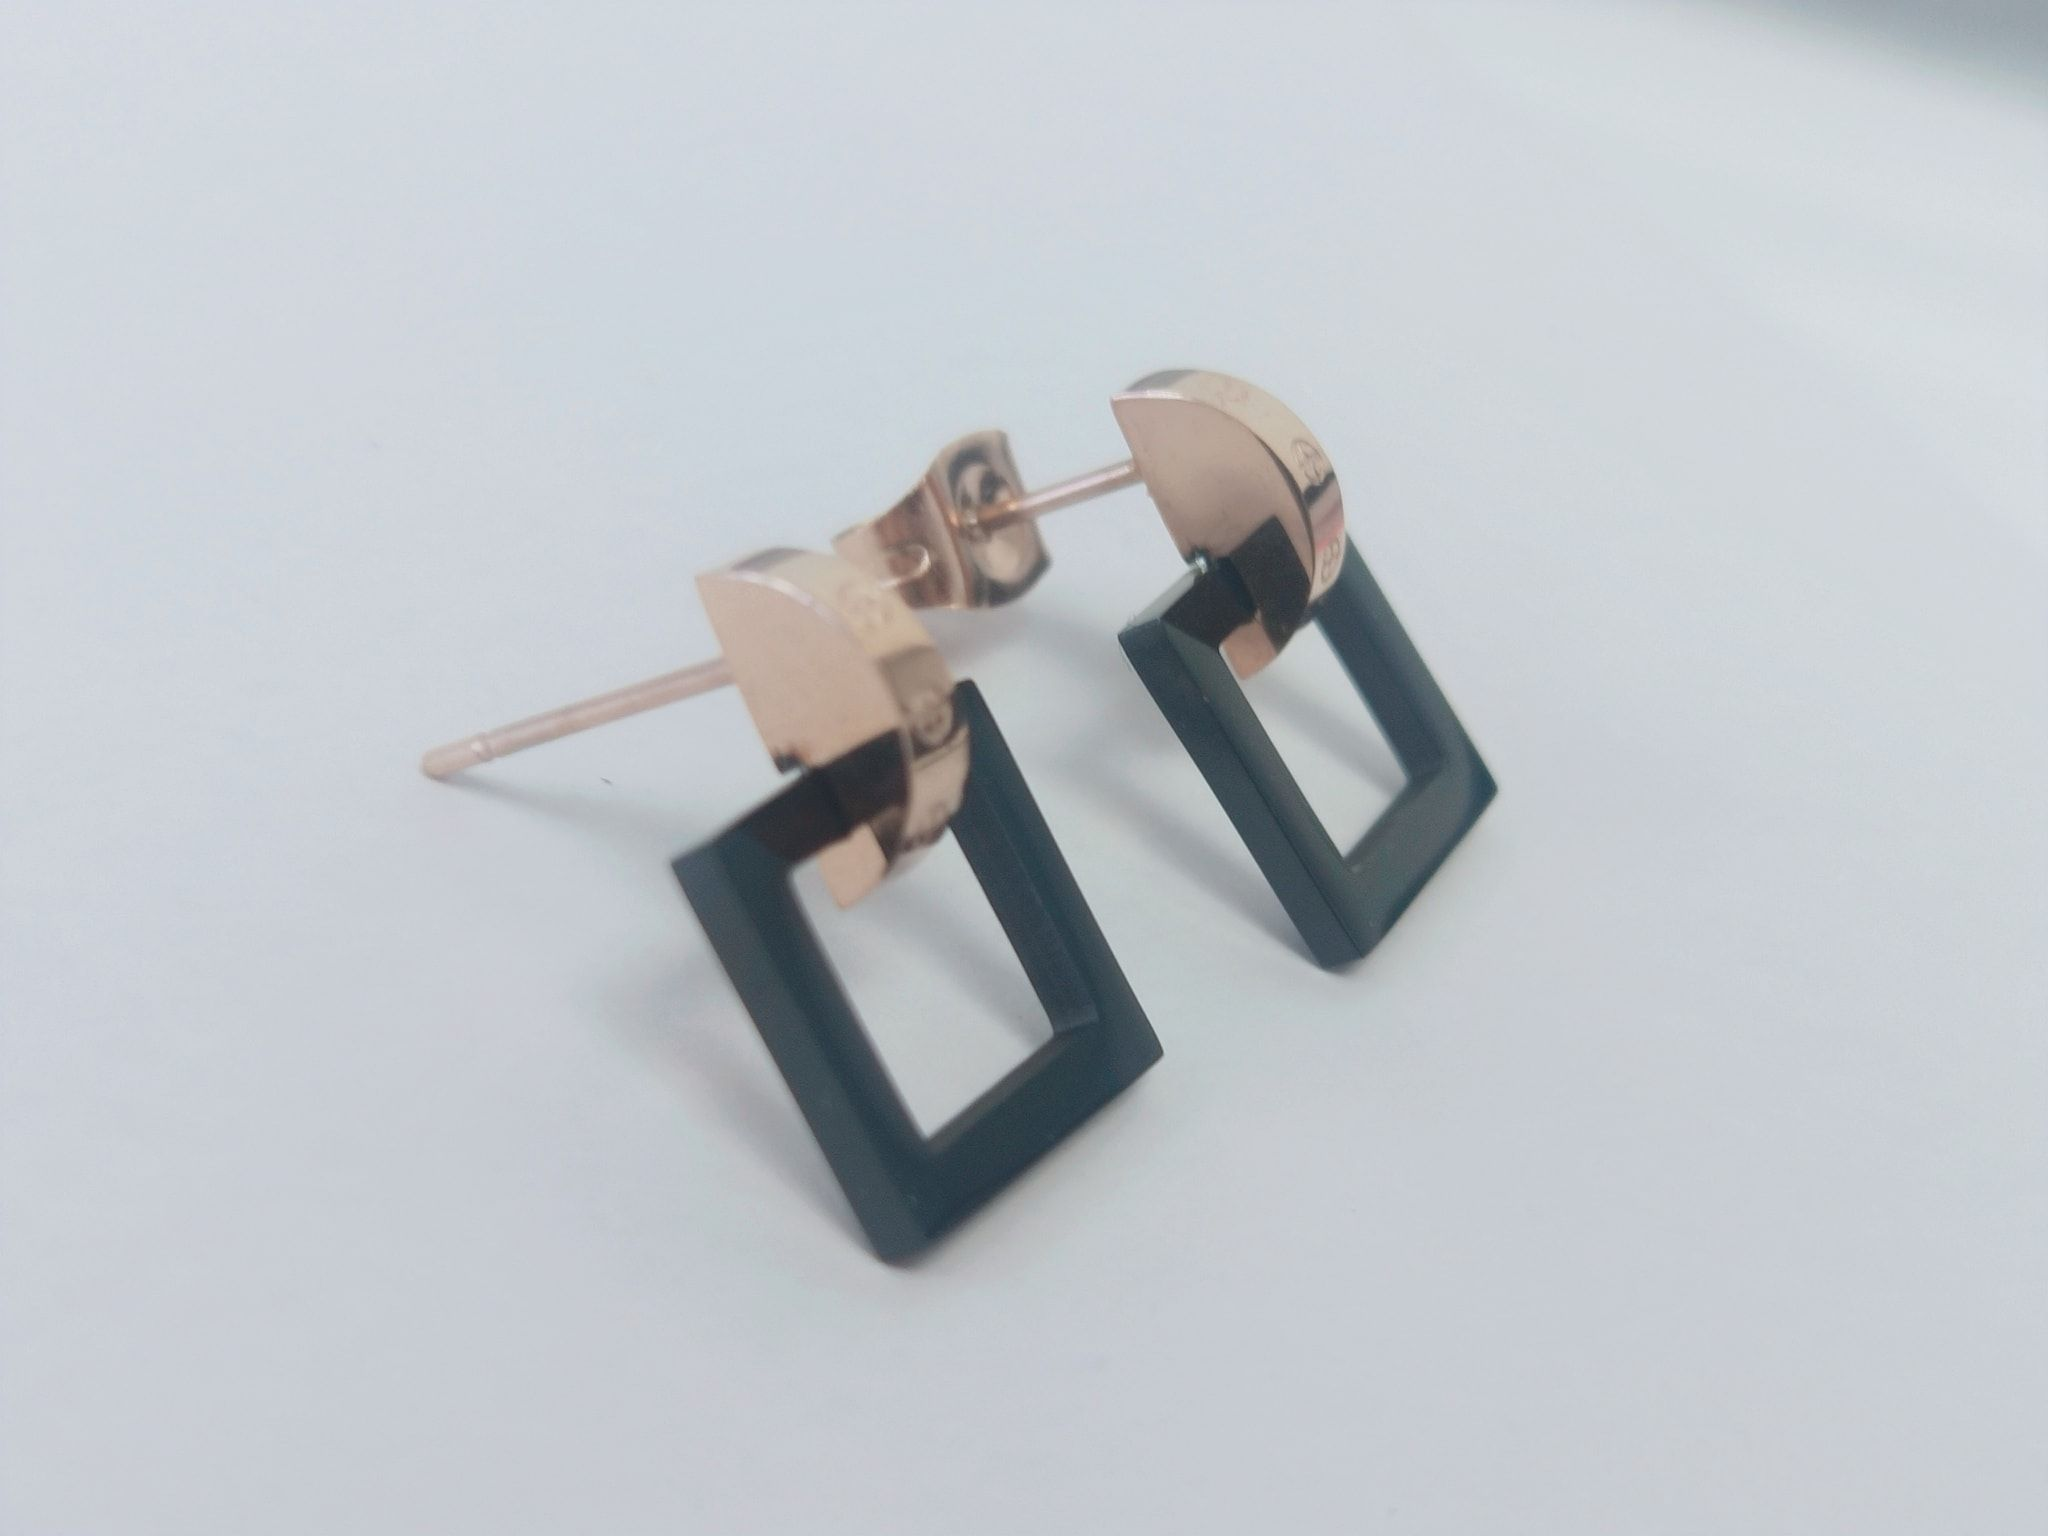 Square  Stainless Steel Nickel Free stud Earring Image